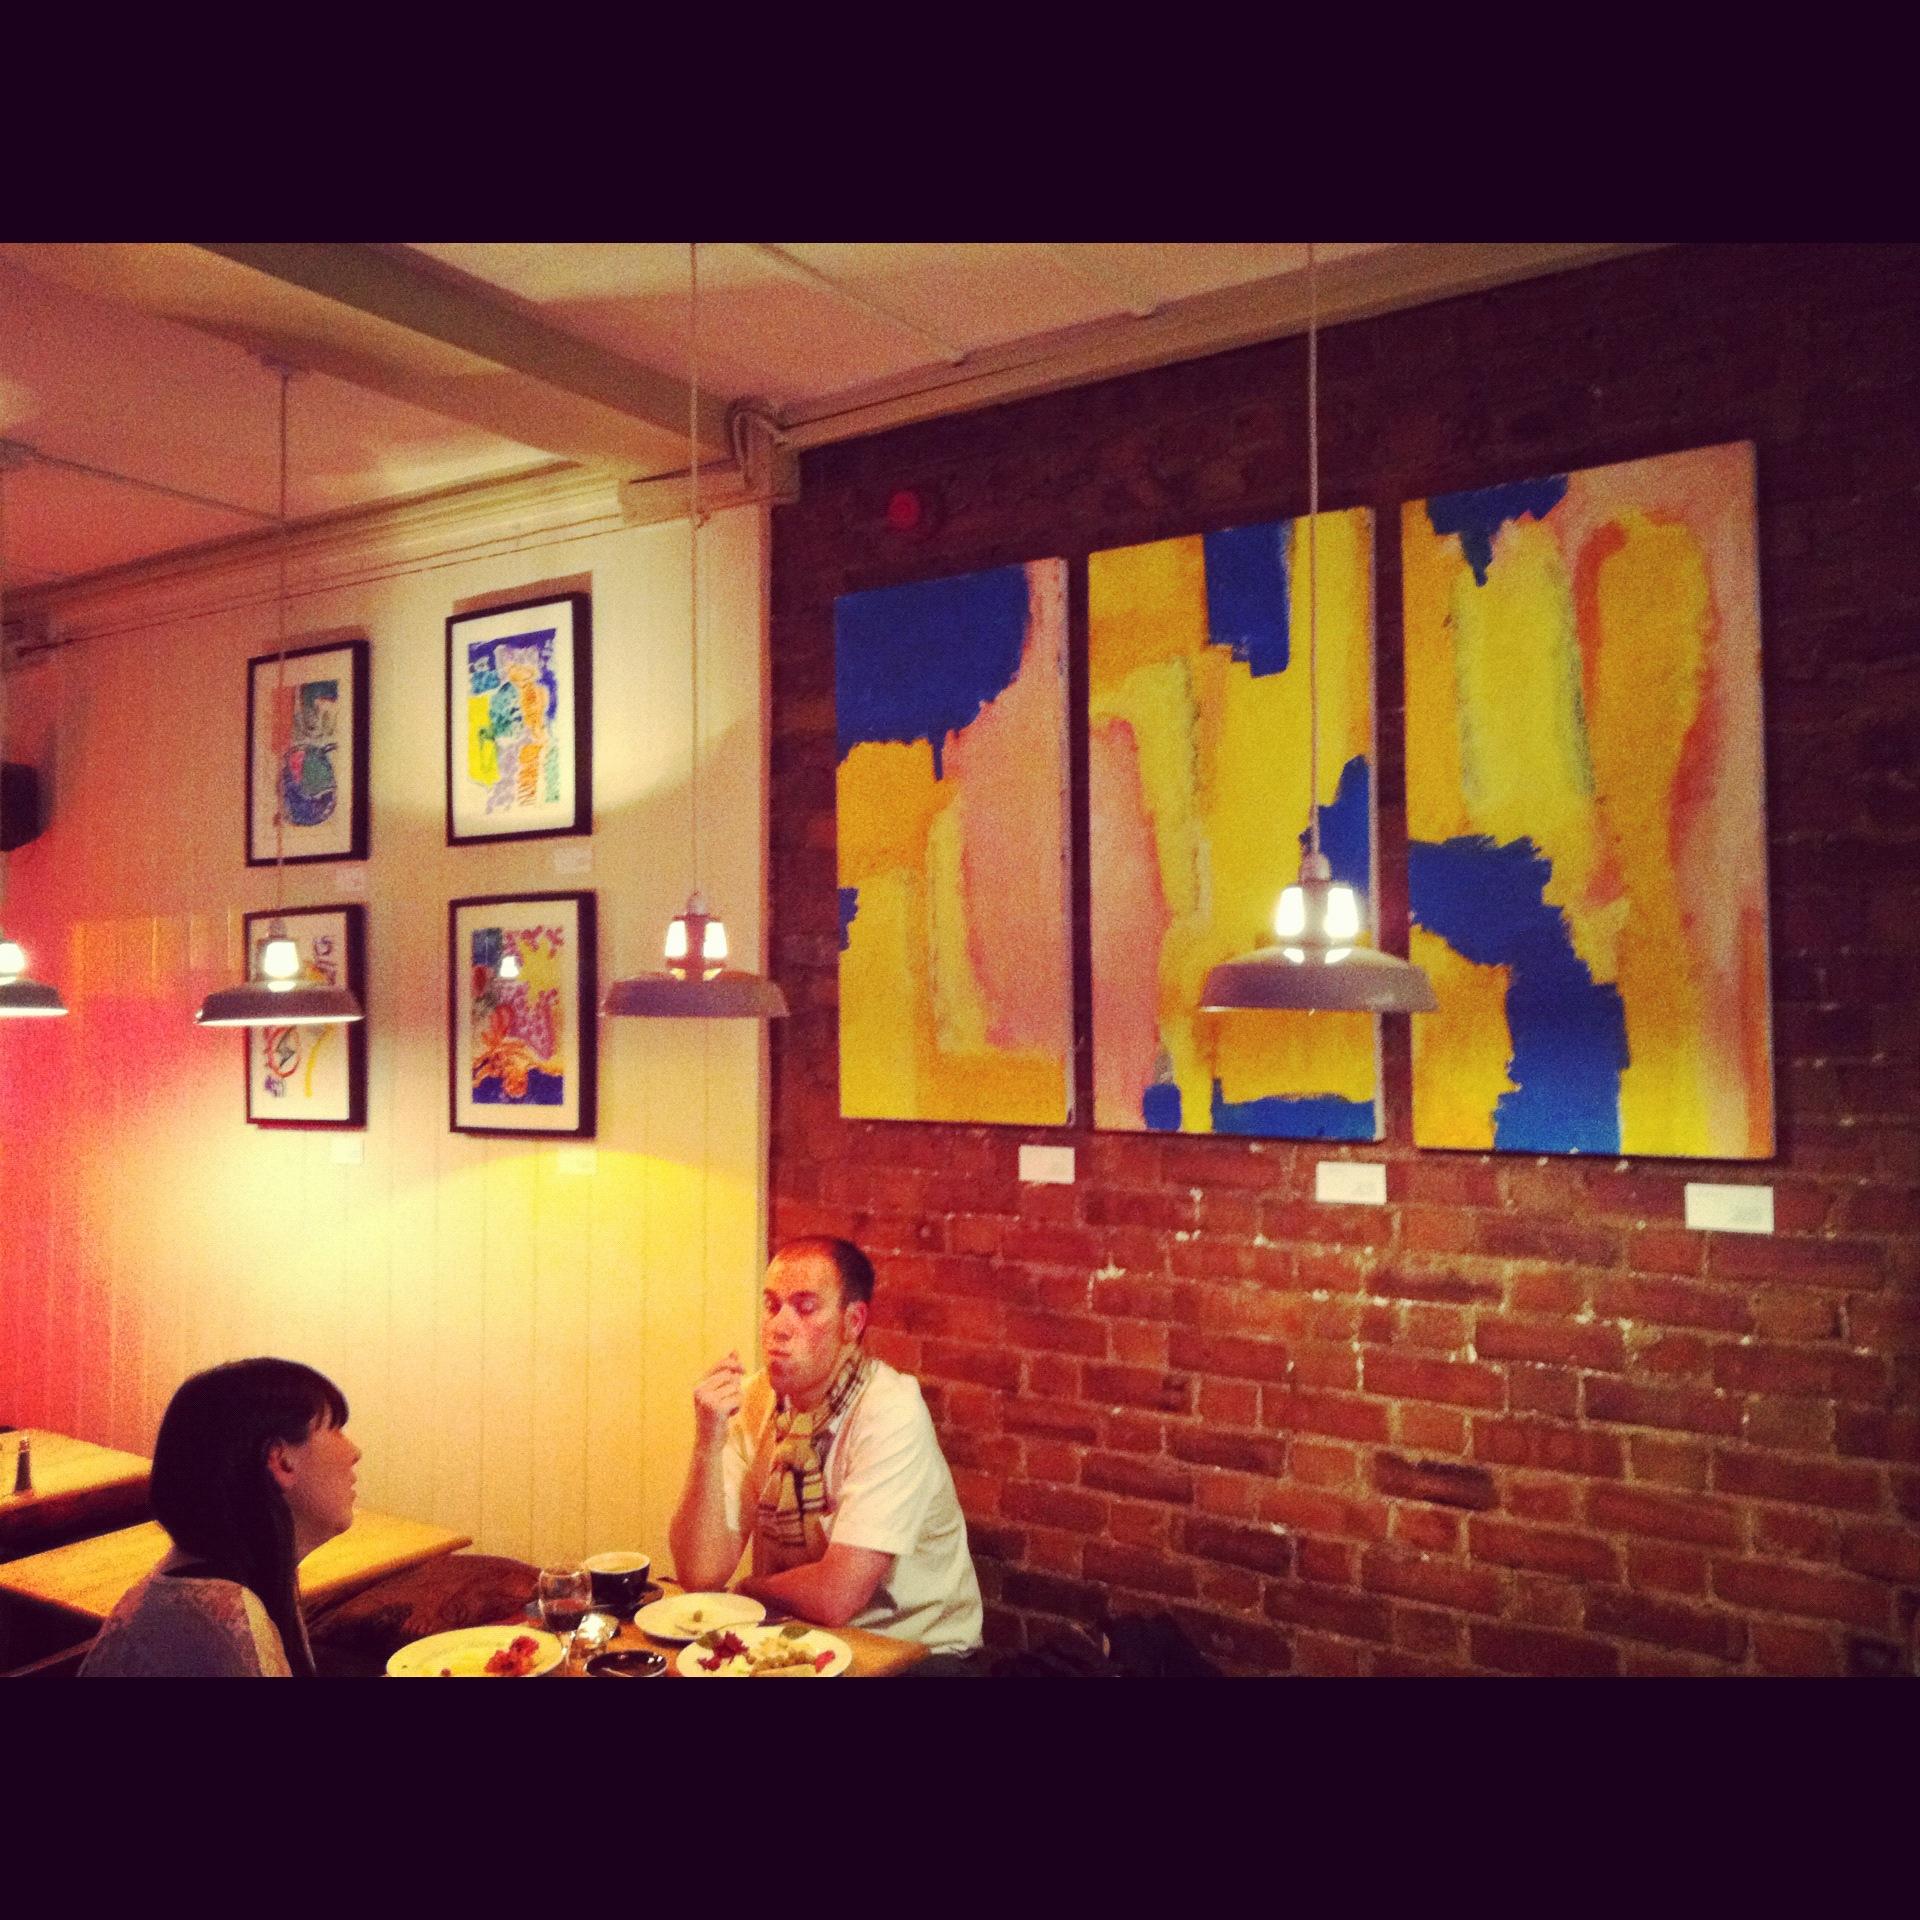 Photo 12-12-2011 17 13 27.jpg